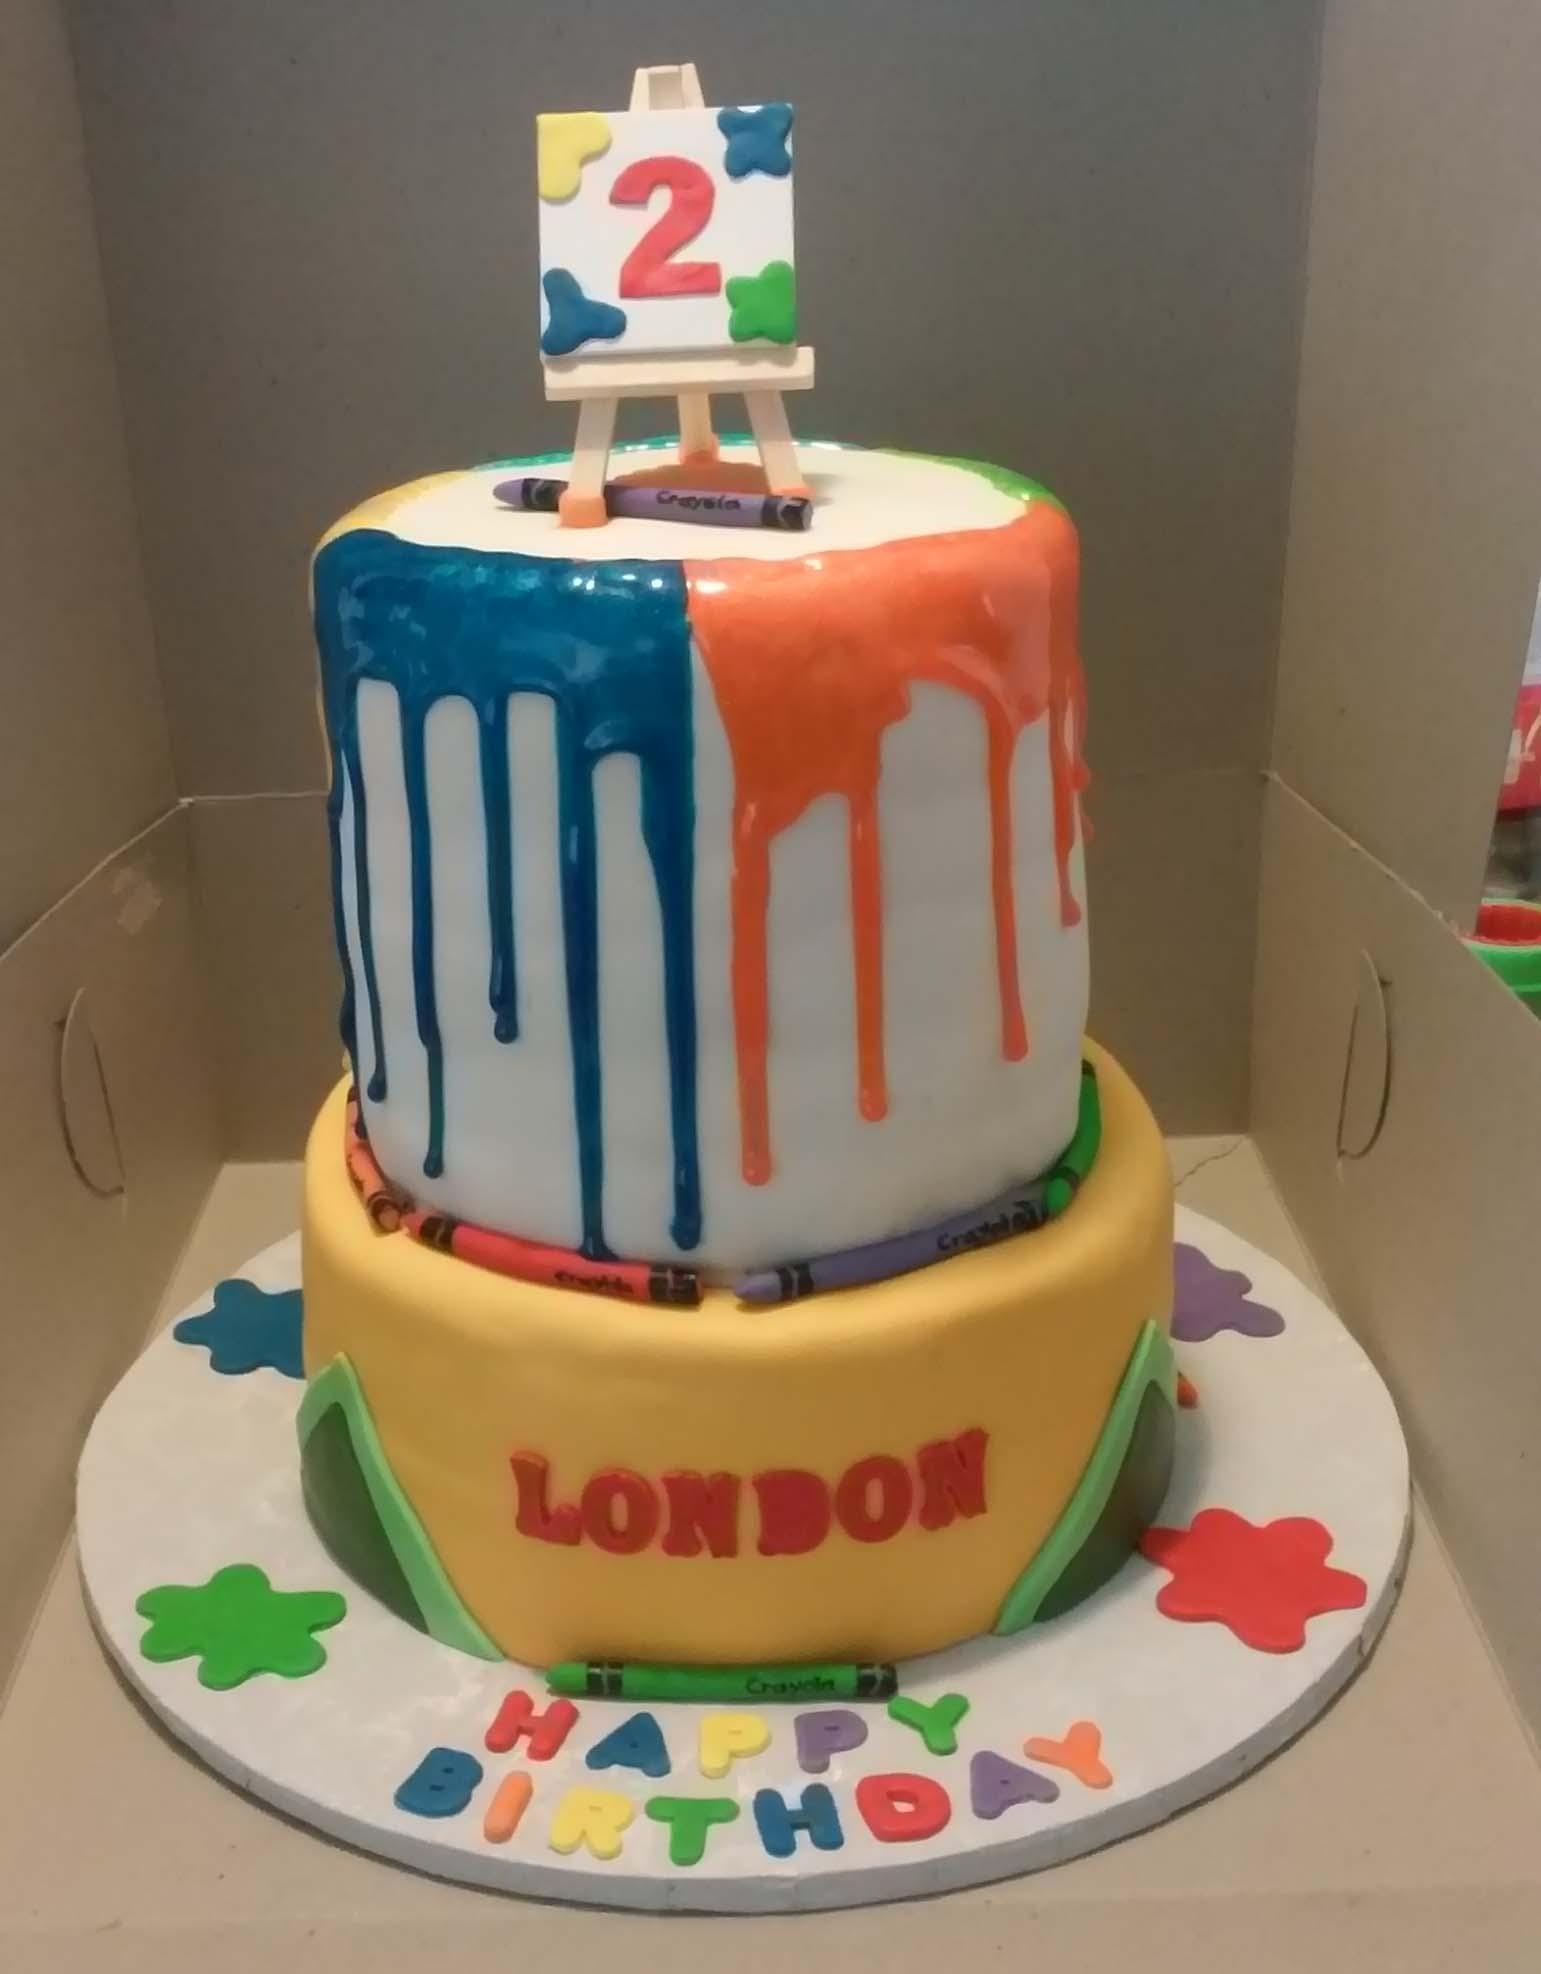 Crayola Crayon Themed 2 Tier Birthday Cake - CakeCentral.com